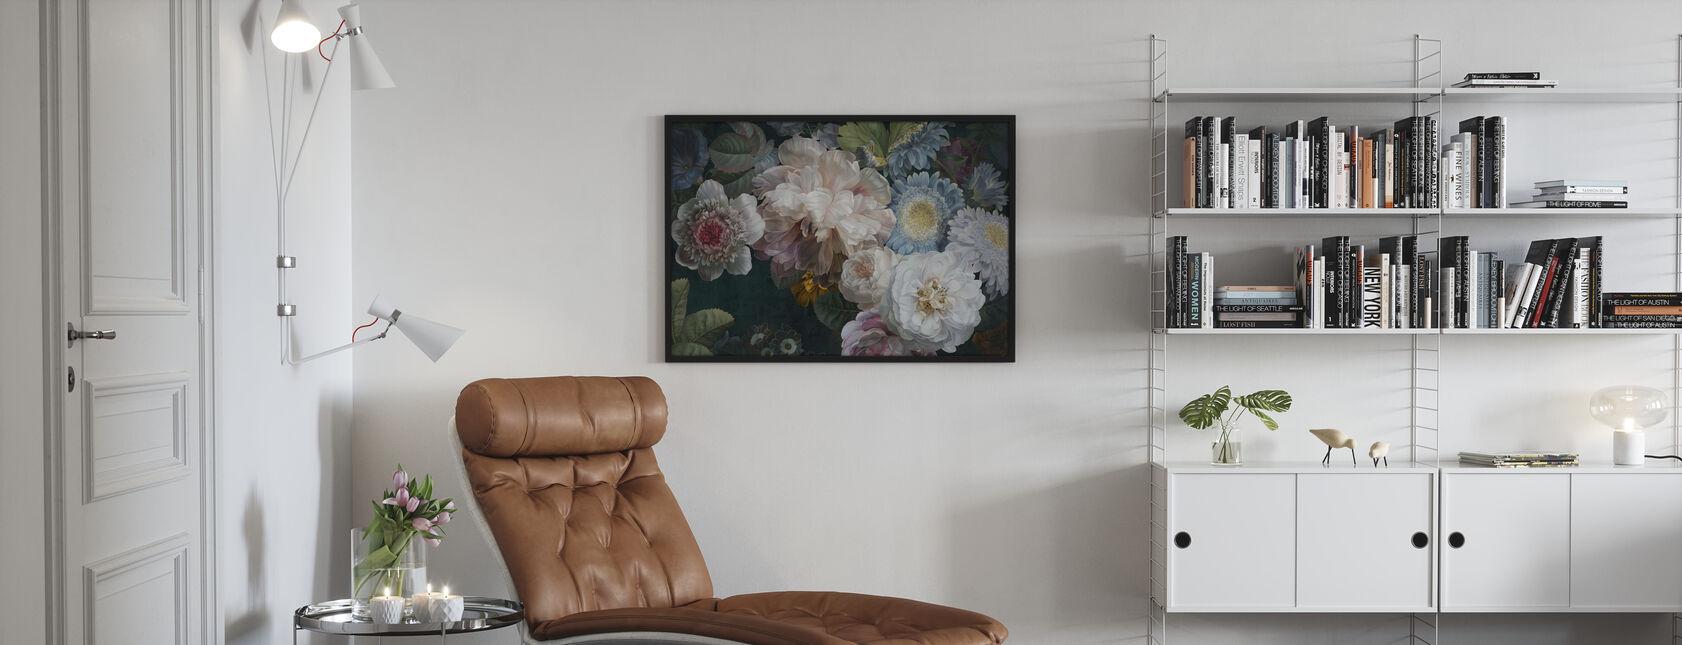 Lustre Arrangement - Ingelijste print - Woonkamer